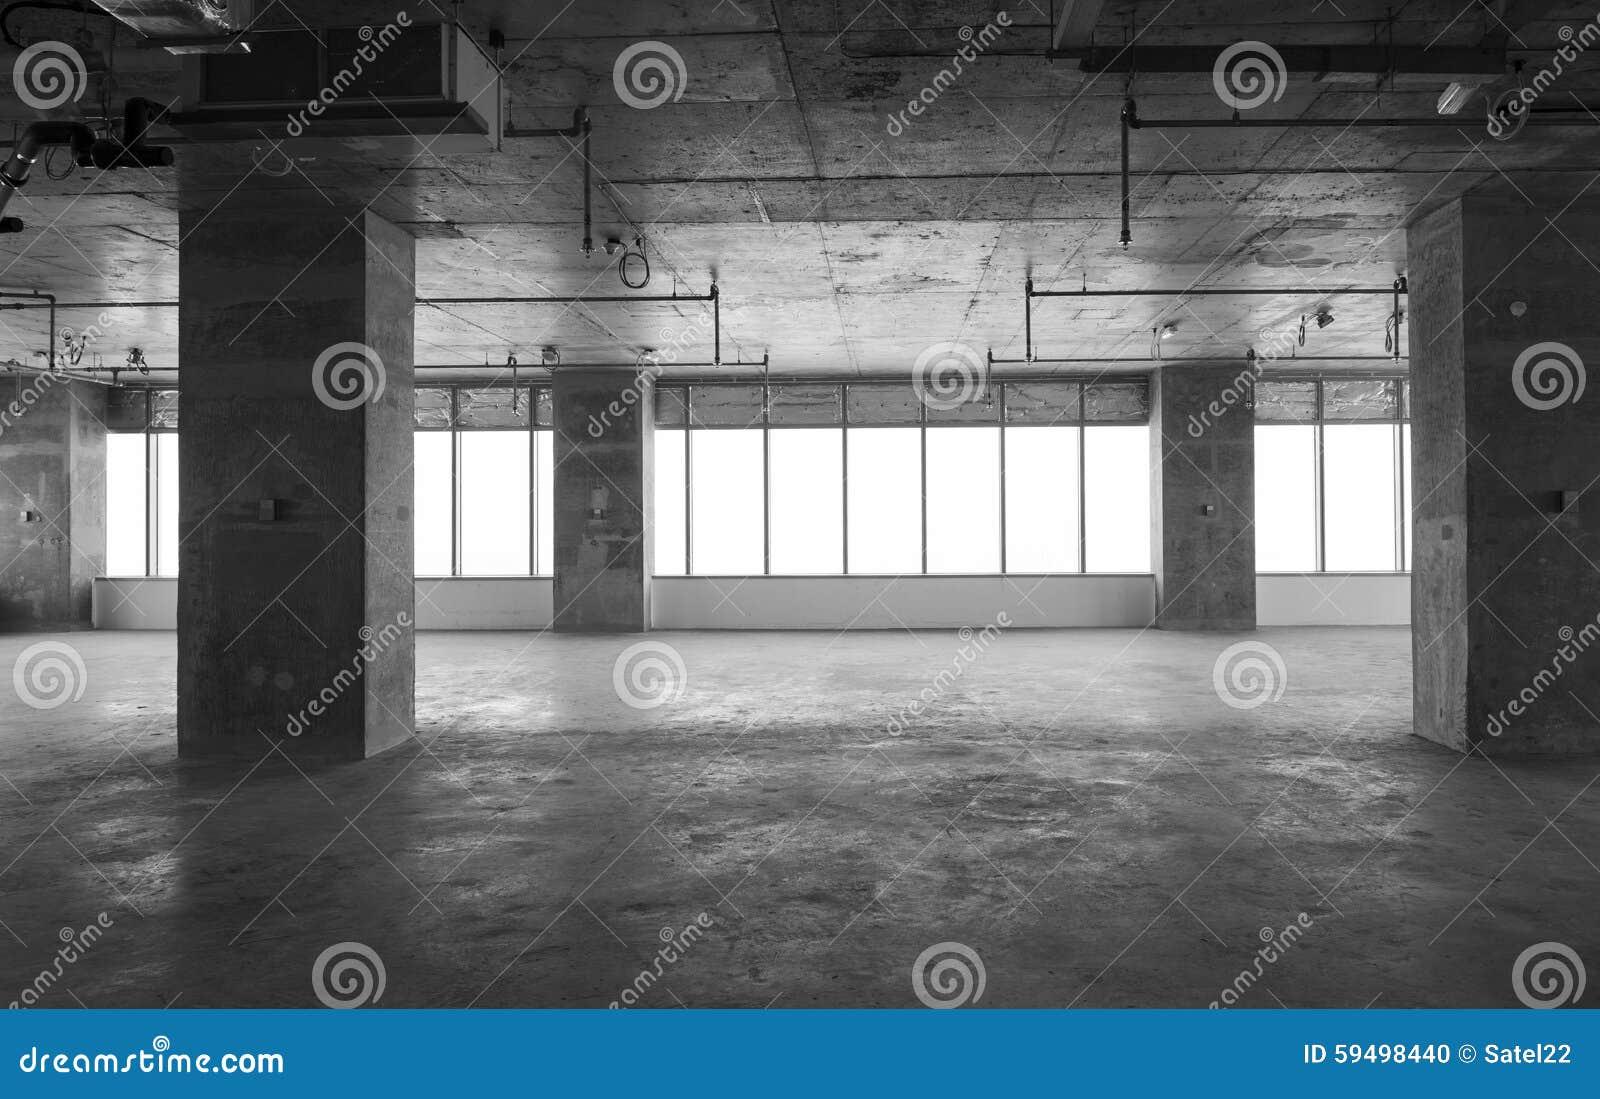 Interior Building Construction : Interior under construction stock photo image